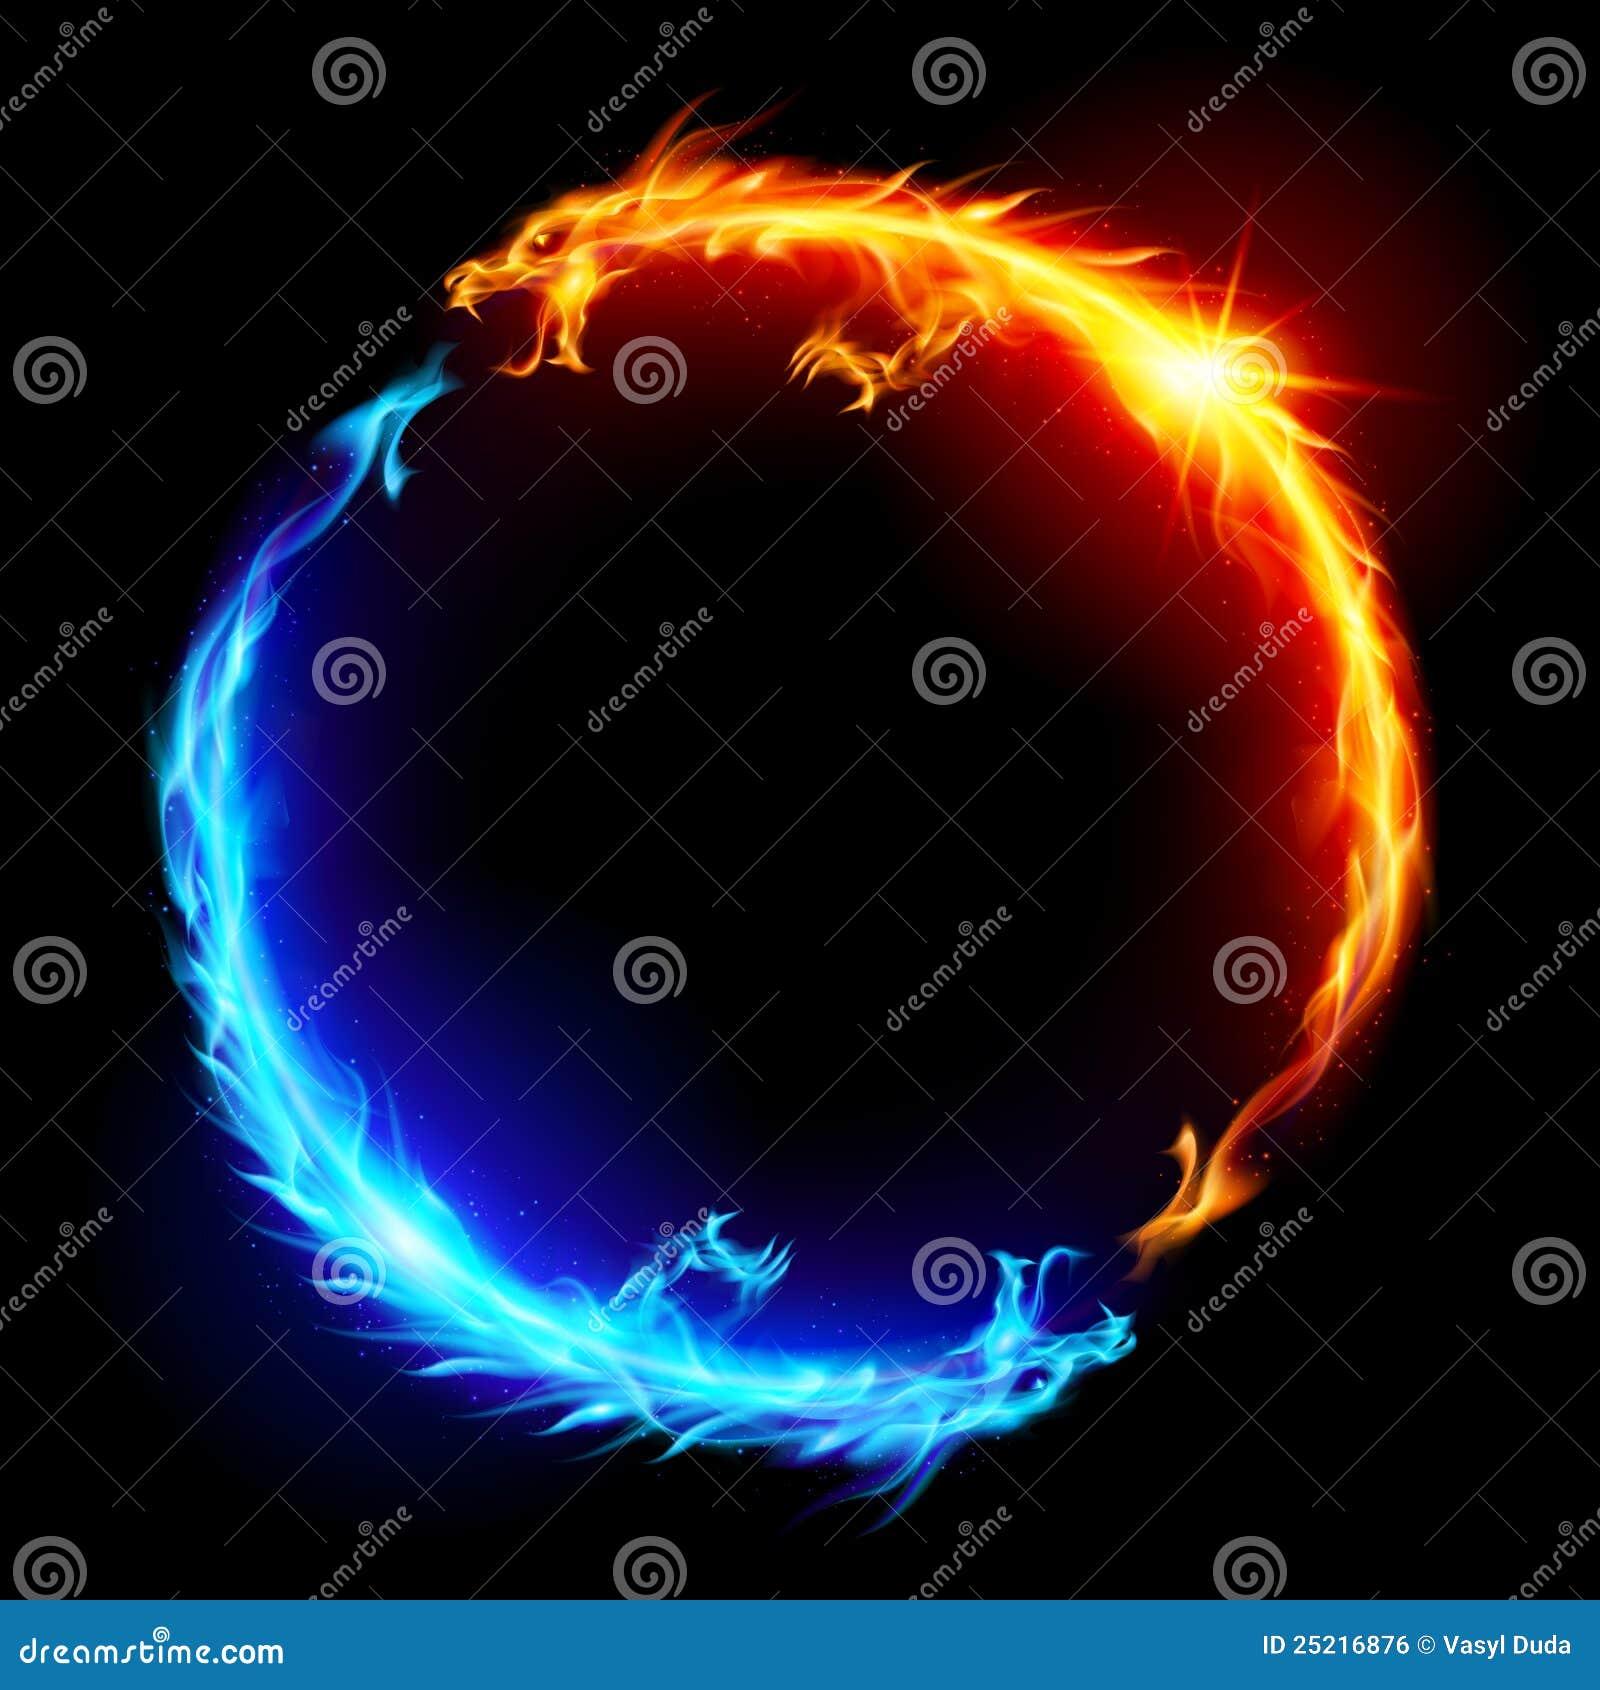 blaues und rotes feuer drachen vektor abbildung bild ying yang vector images ying yang vector art